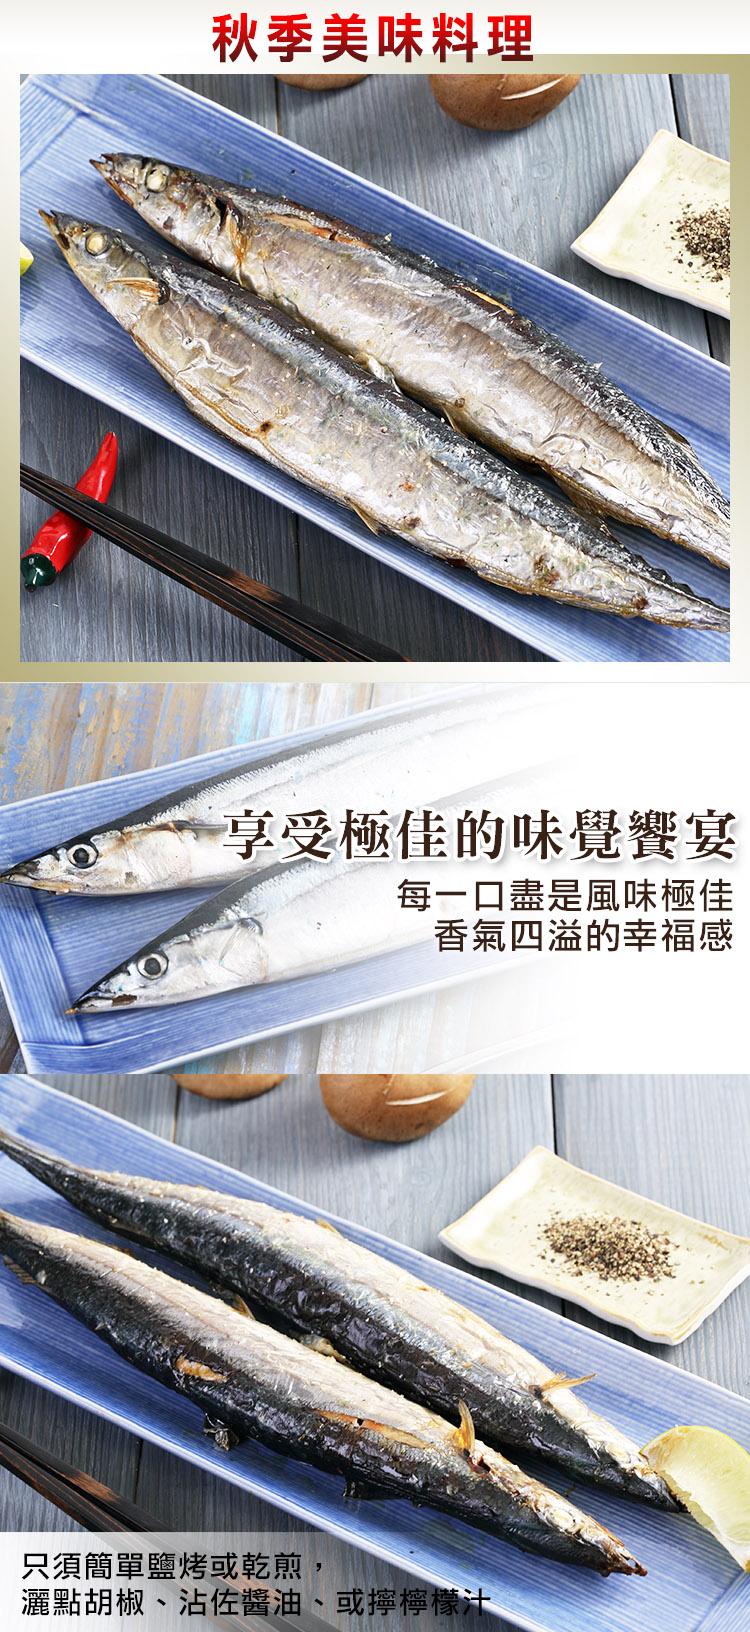 sauryfish11